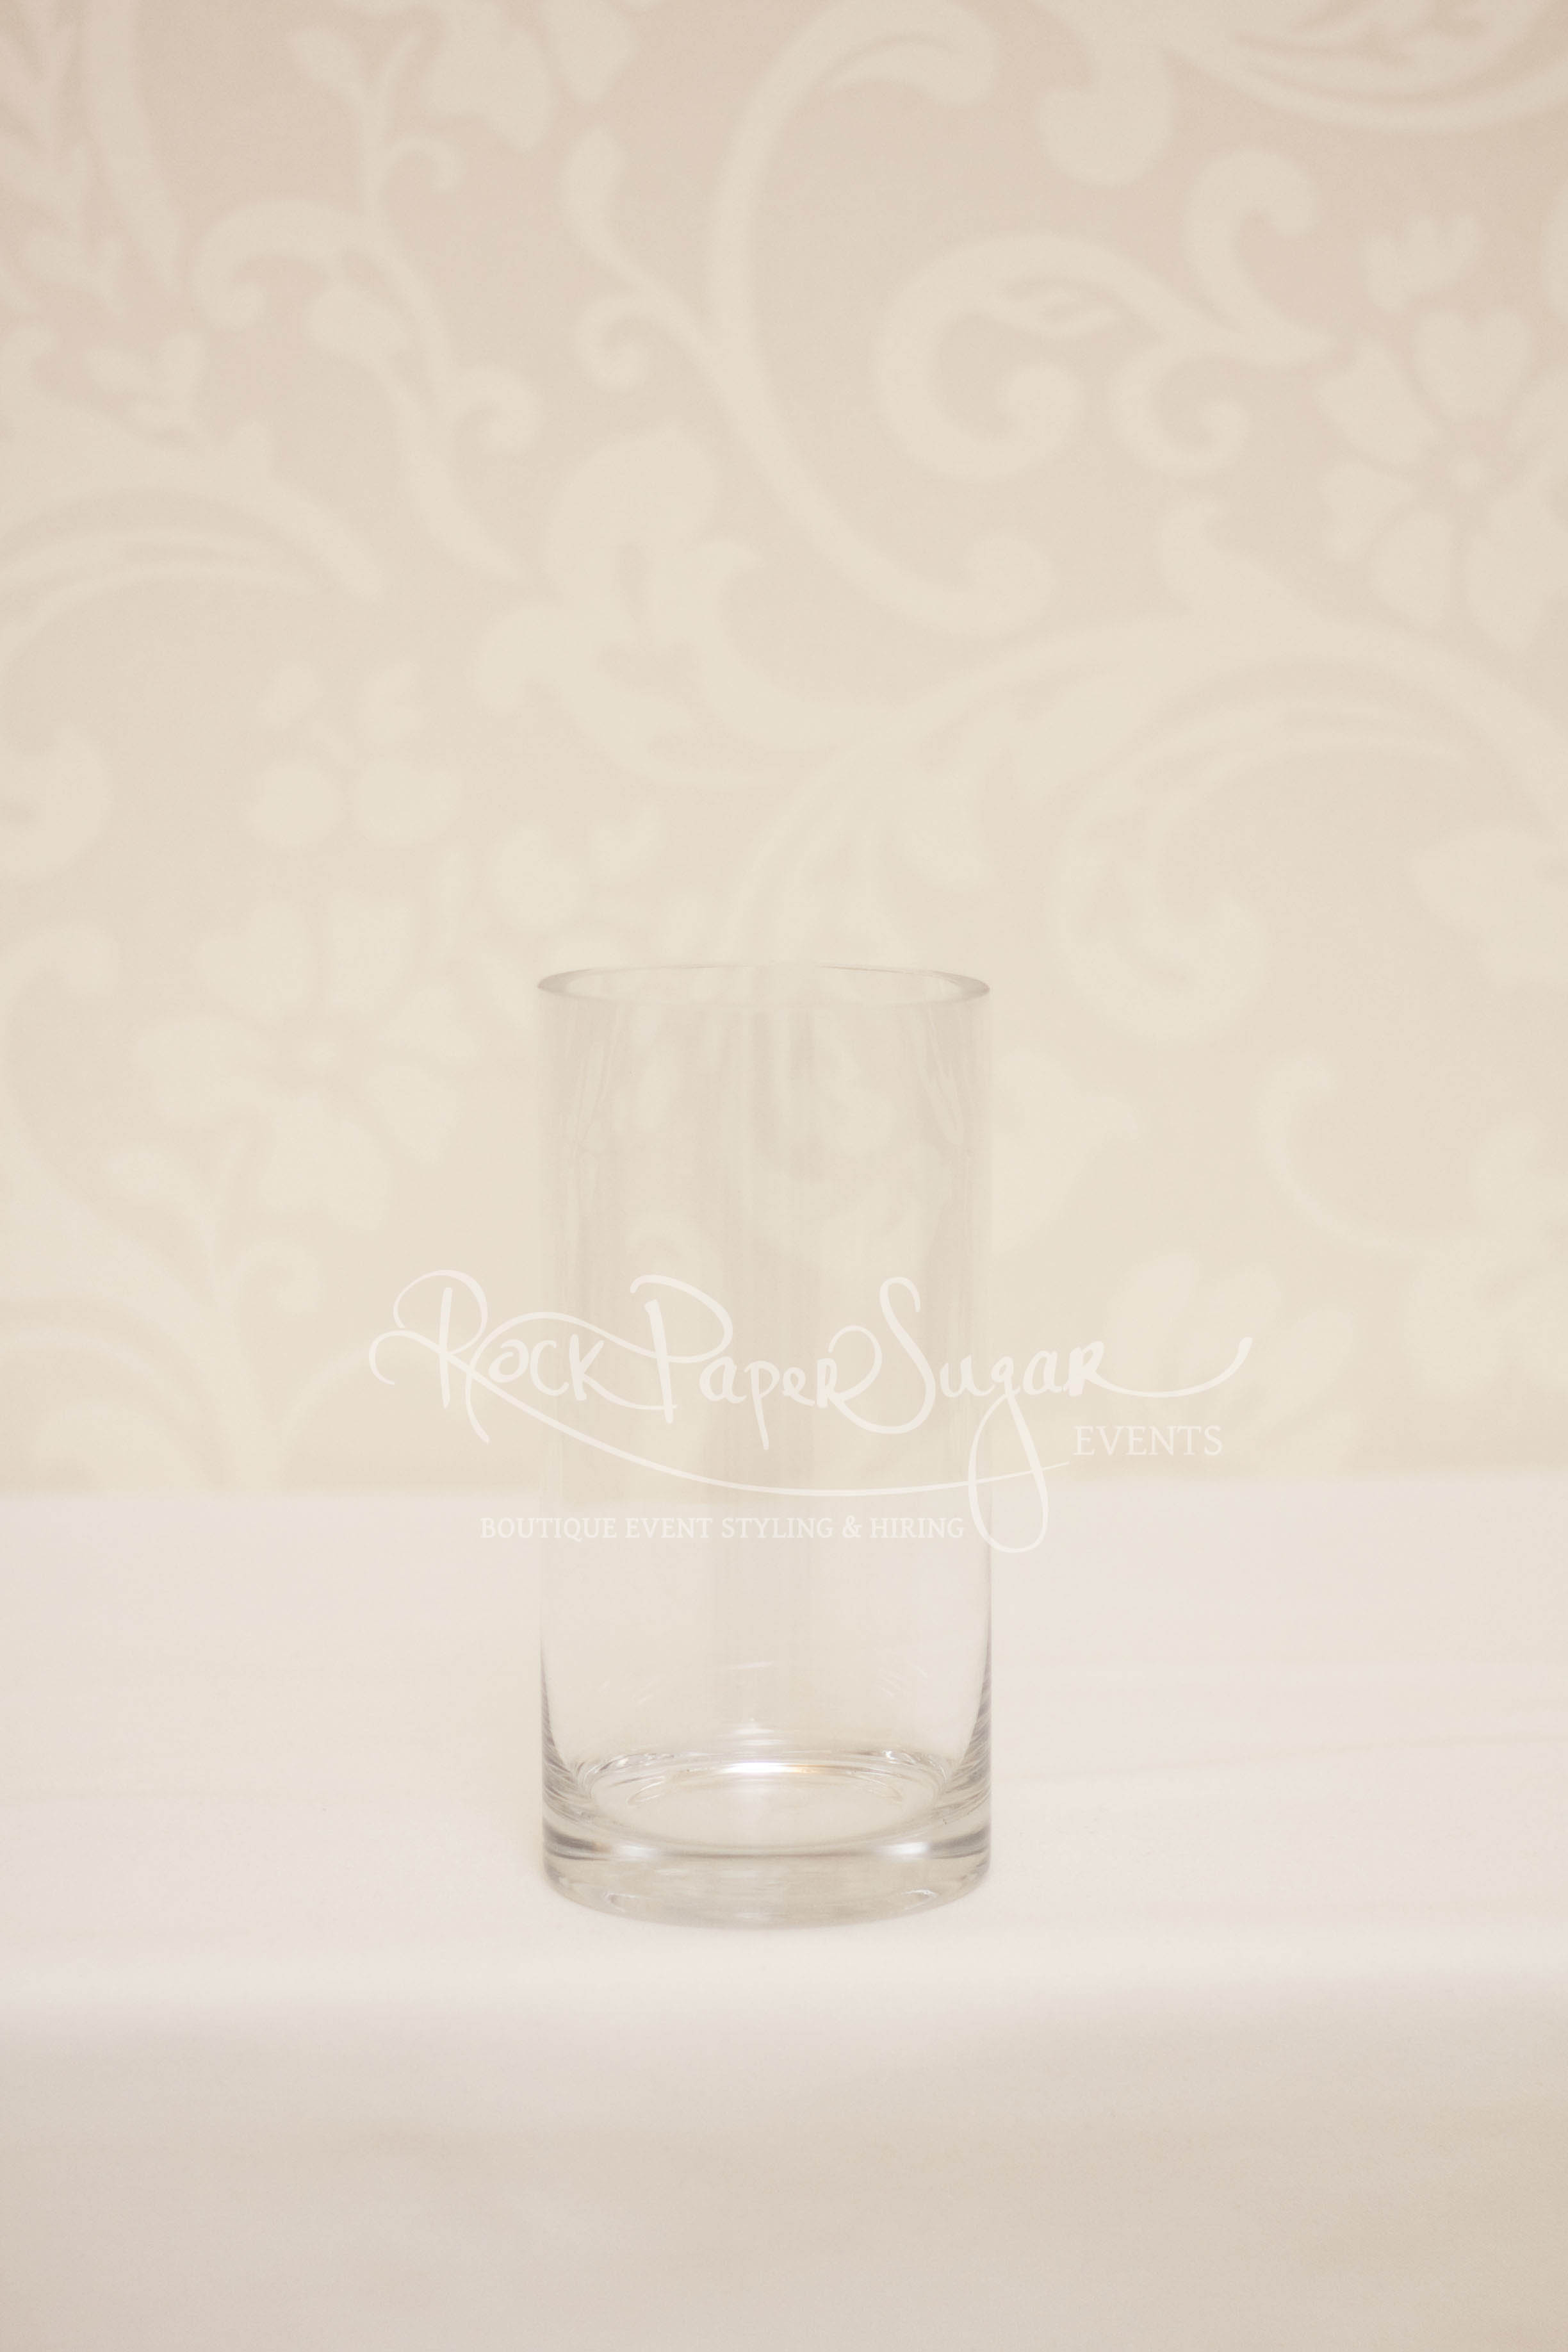 Rock Paper Sugar Events Glassware 009.jpg